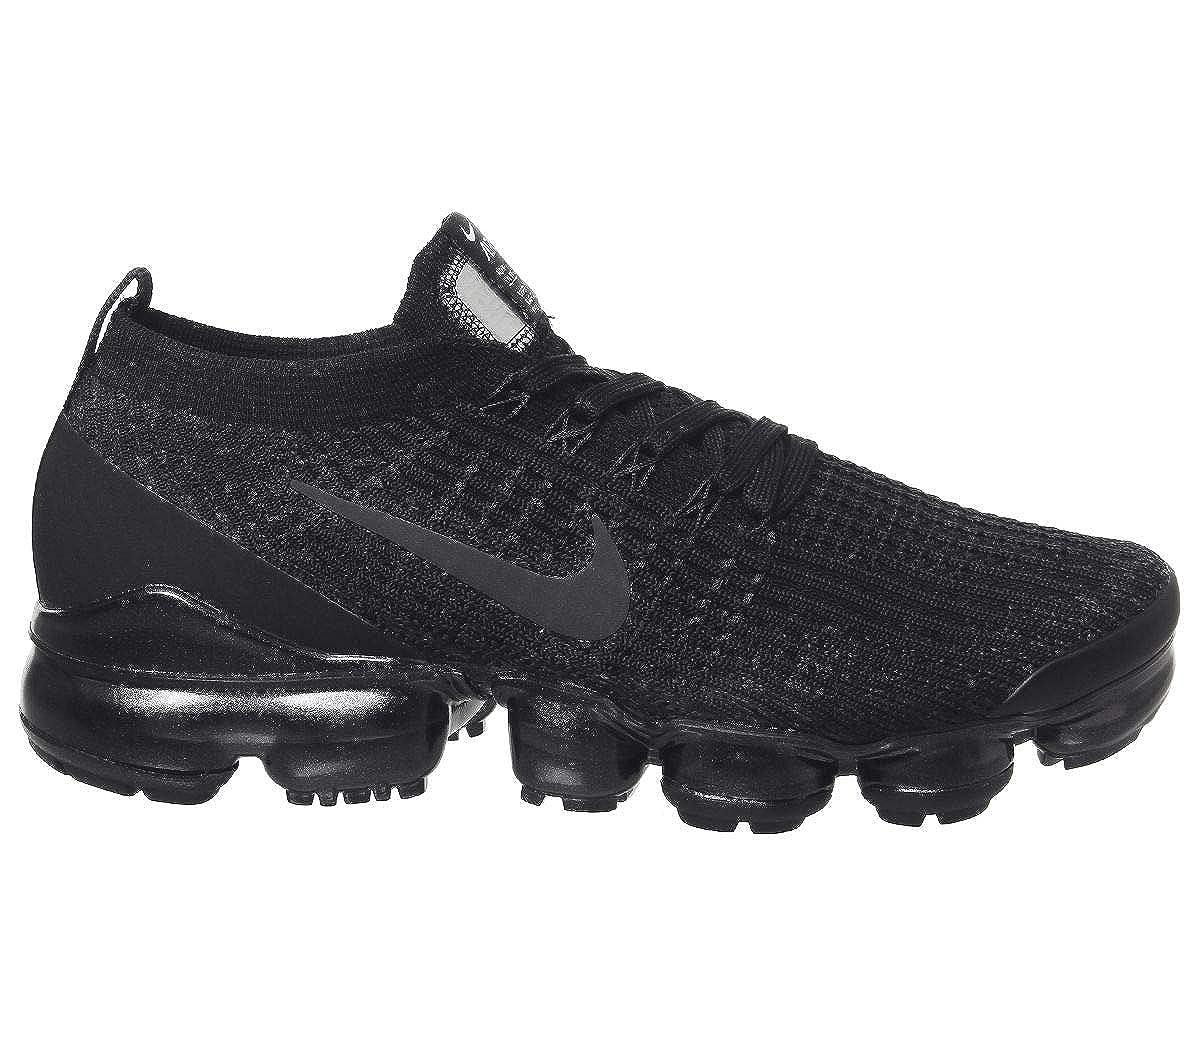 Nike W Air Vapormax Flyknit 3 Zapatillas de Atletismo para Mujer